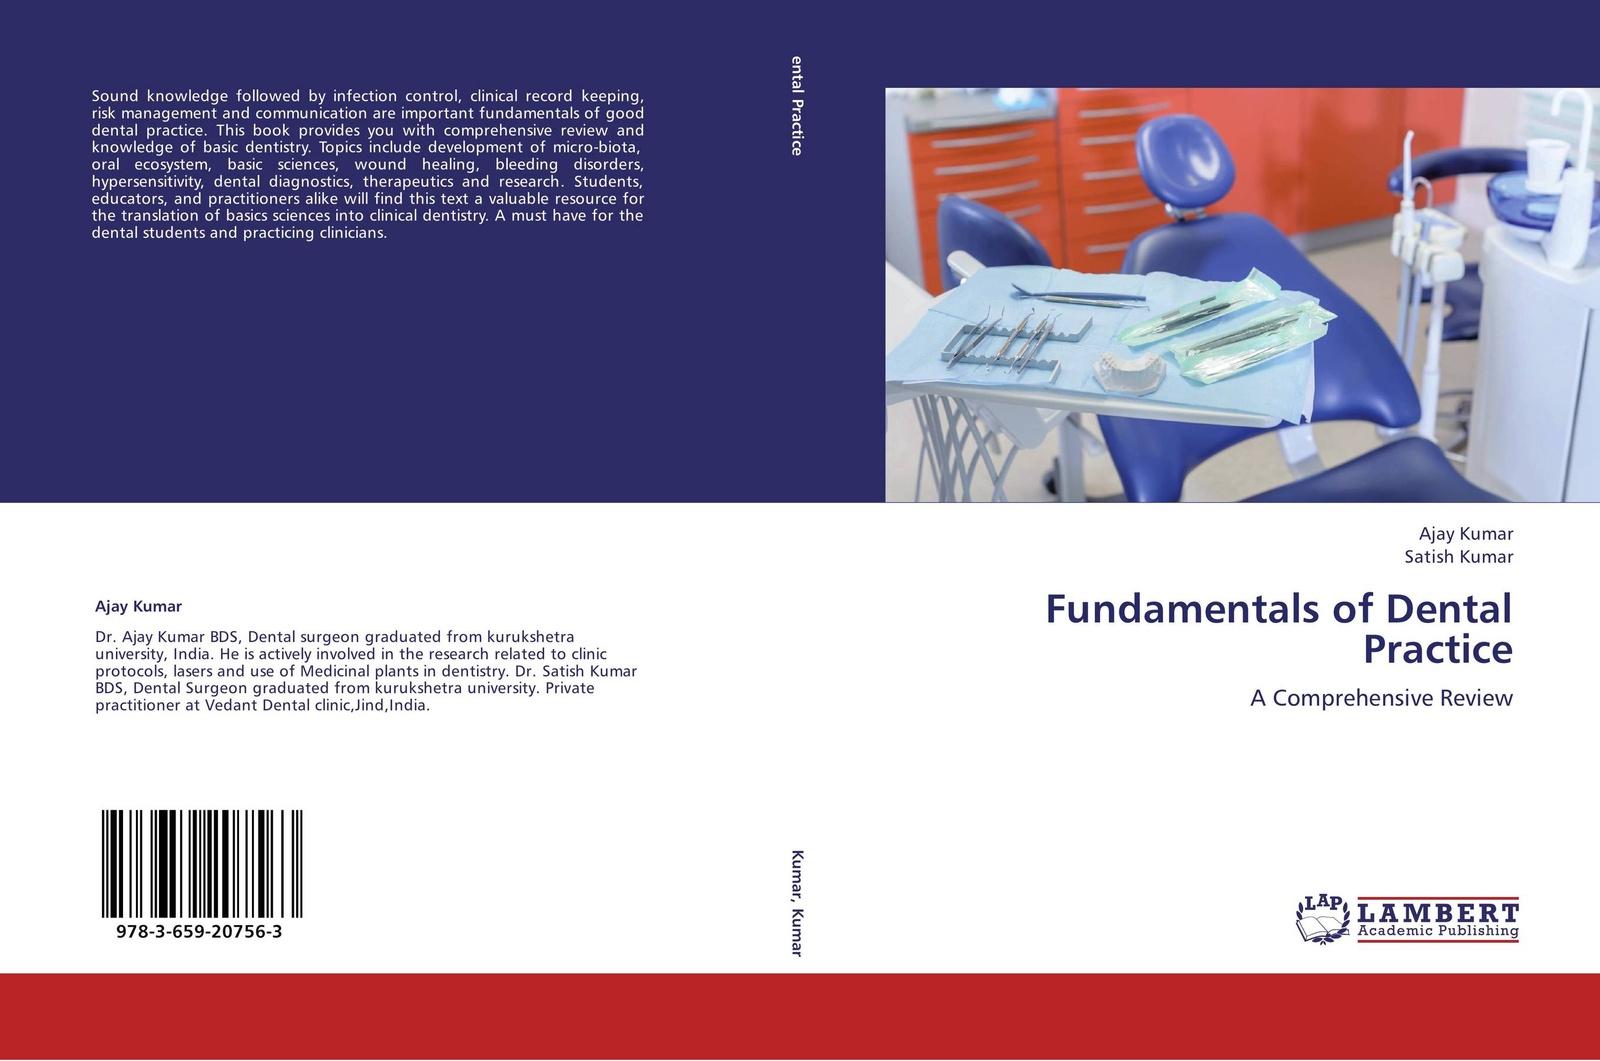 Ajay Kumar and Satish Kumar Fundamentals of Dental Practice недорого